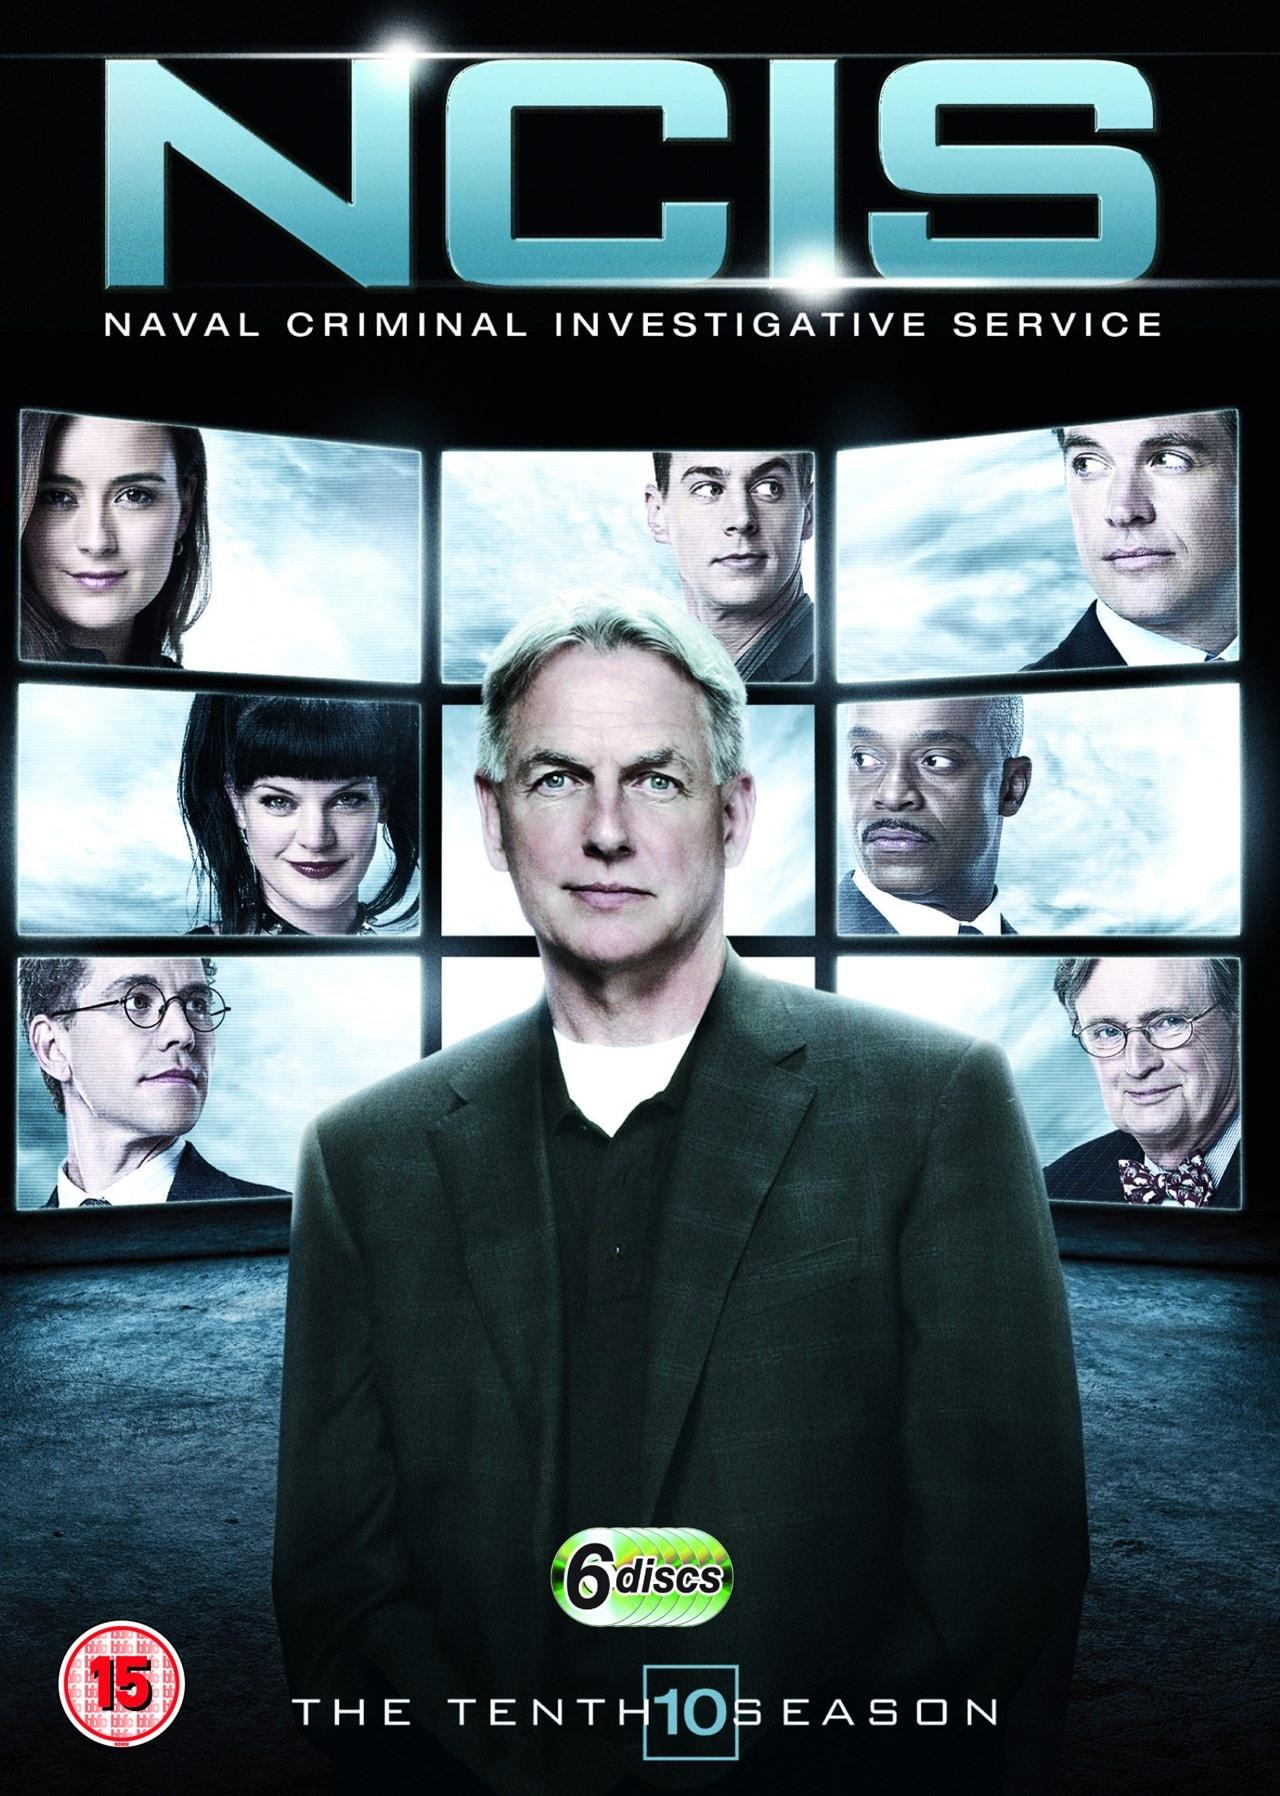 NCIS: The Tenth Season - 1